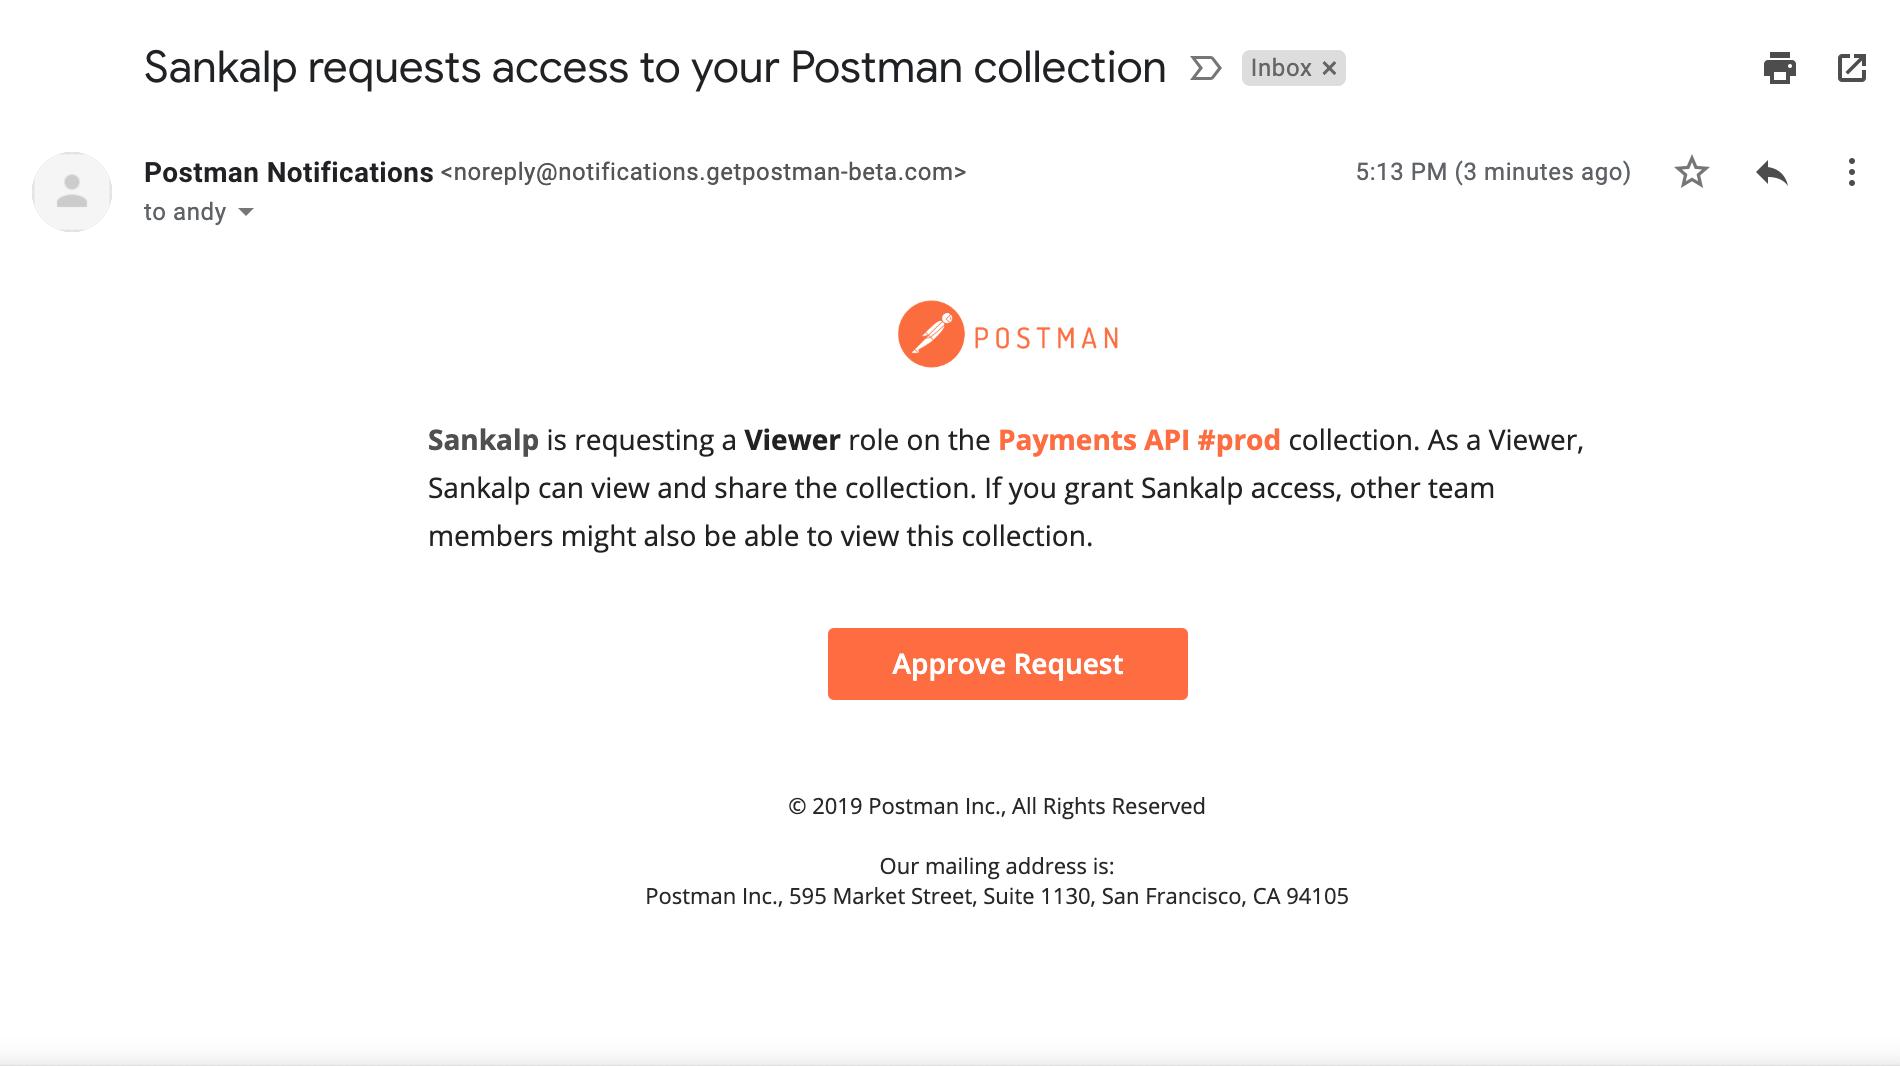 https://assets.postman.com/postman-docs/request-access-mail.png